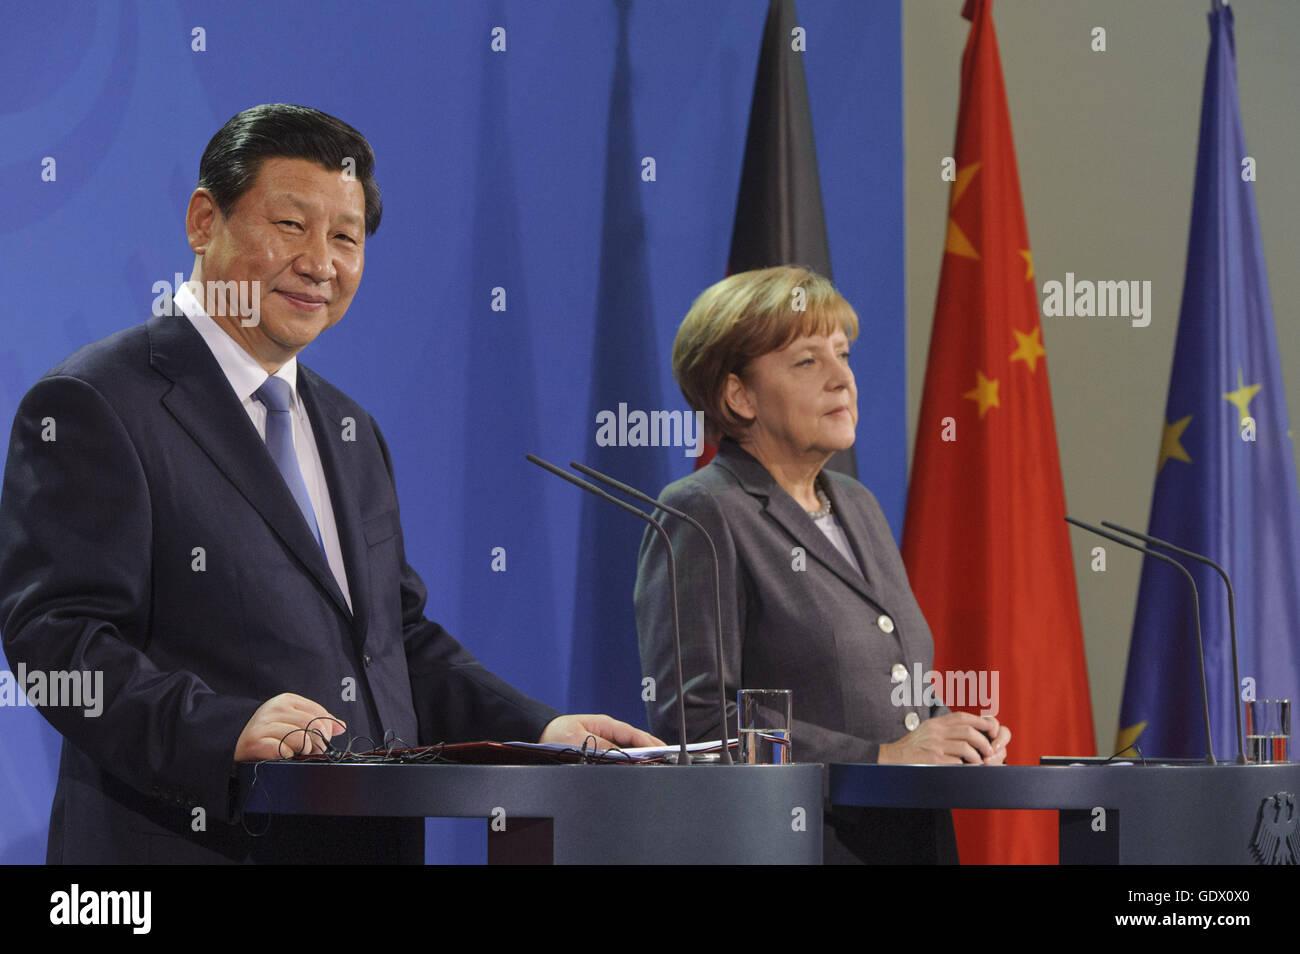 Xi and Merkel - Stock Image